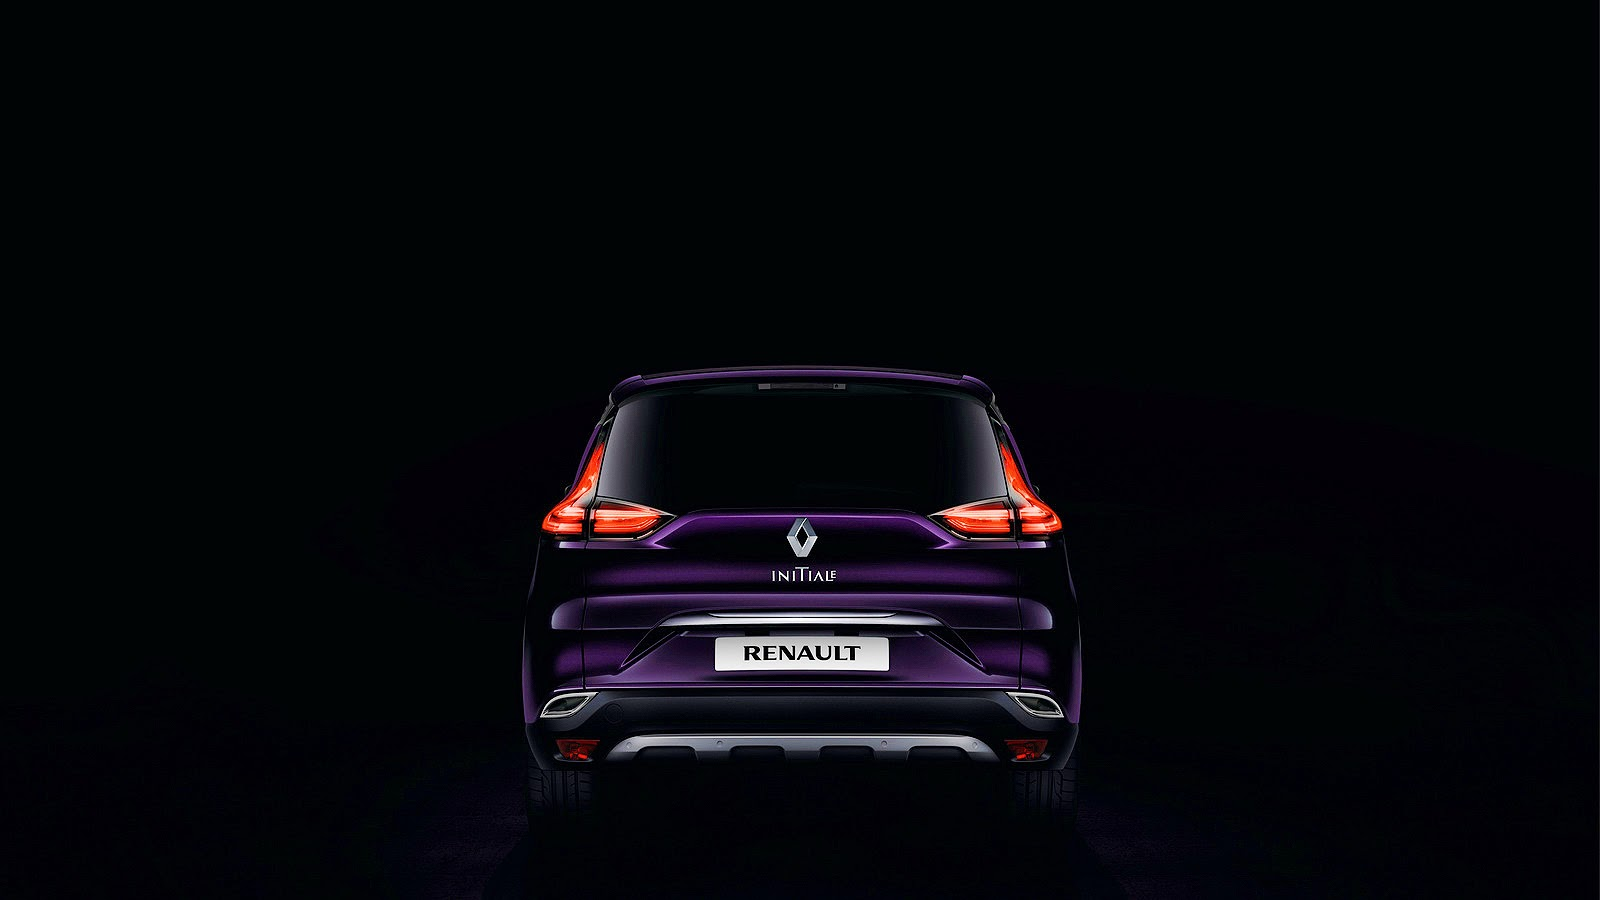 Renault espace 3 service manual fr ebook array renault espace initiale paris 2015 160 cv 200 cv carwp rh carwp blogspot com fandeluxe Choice Image